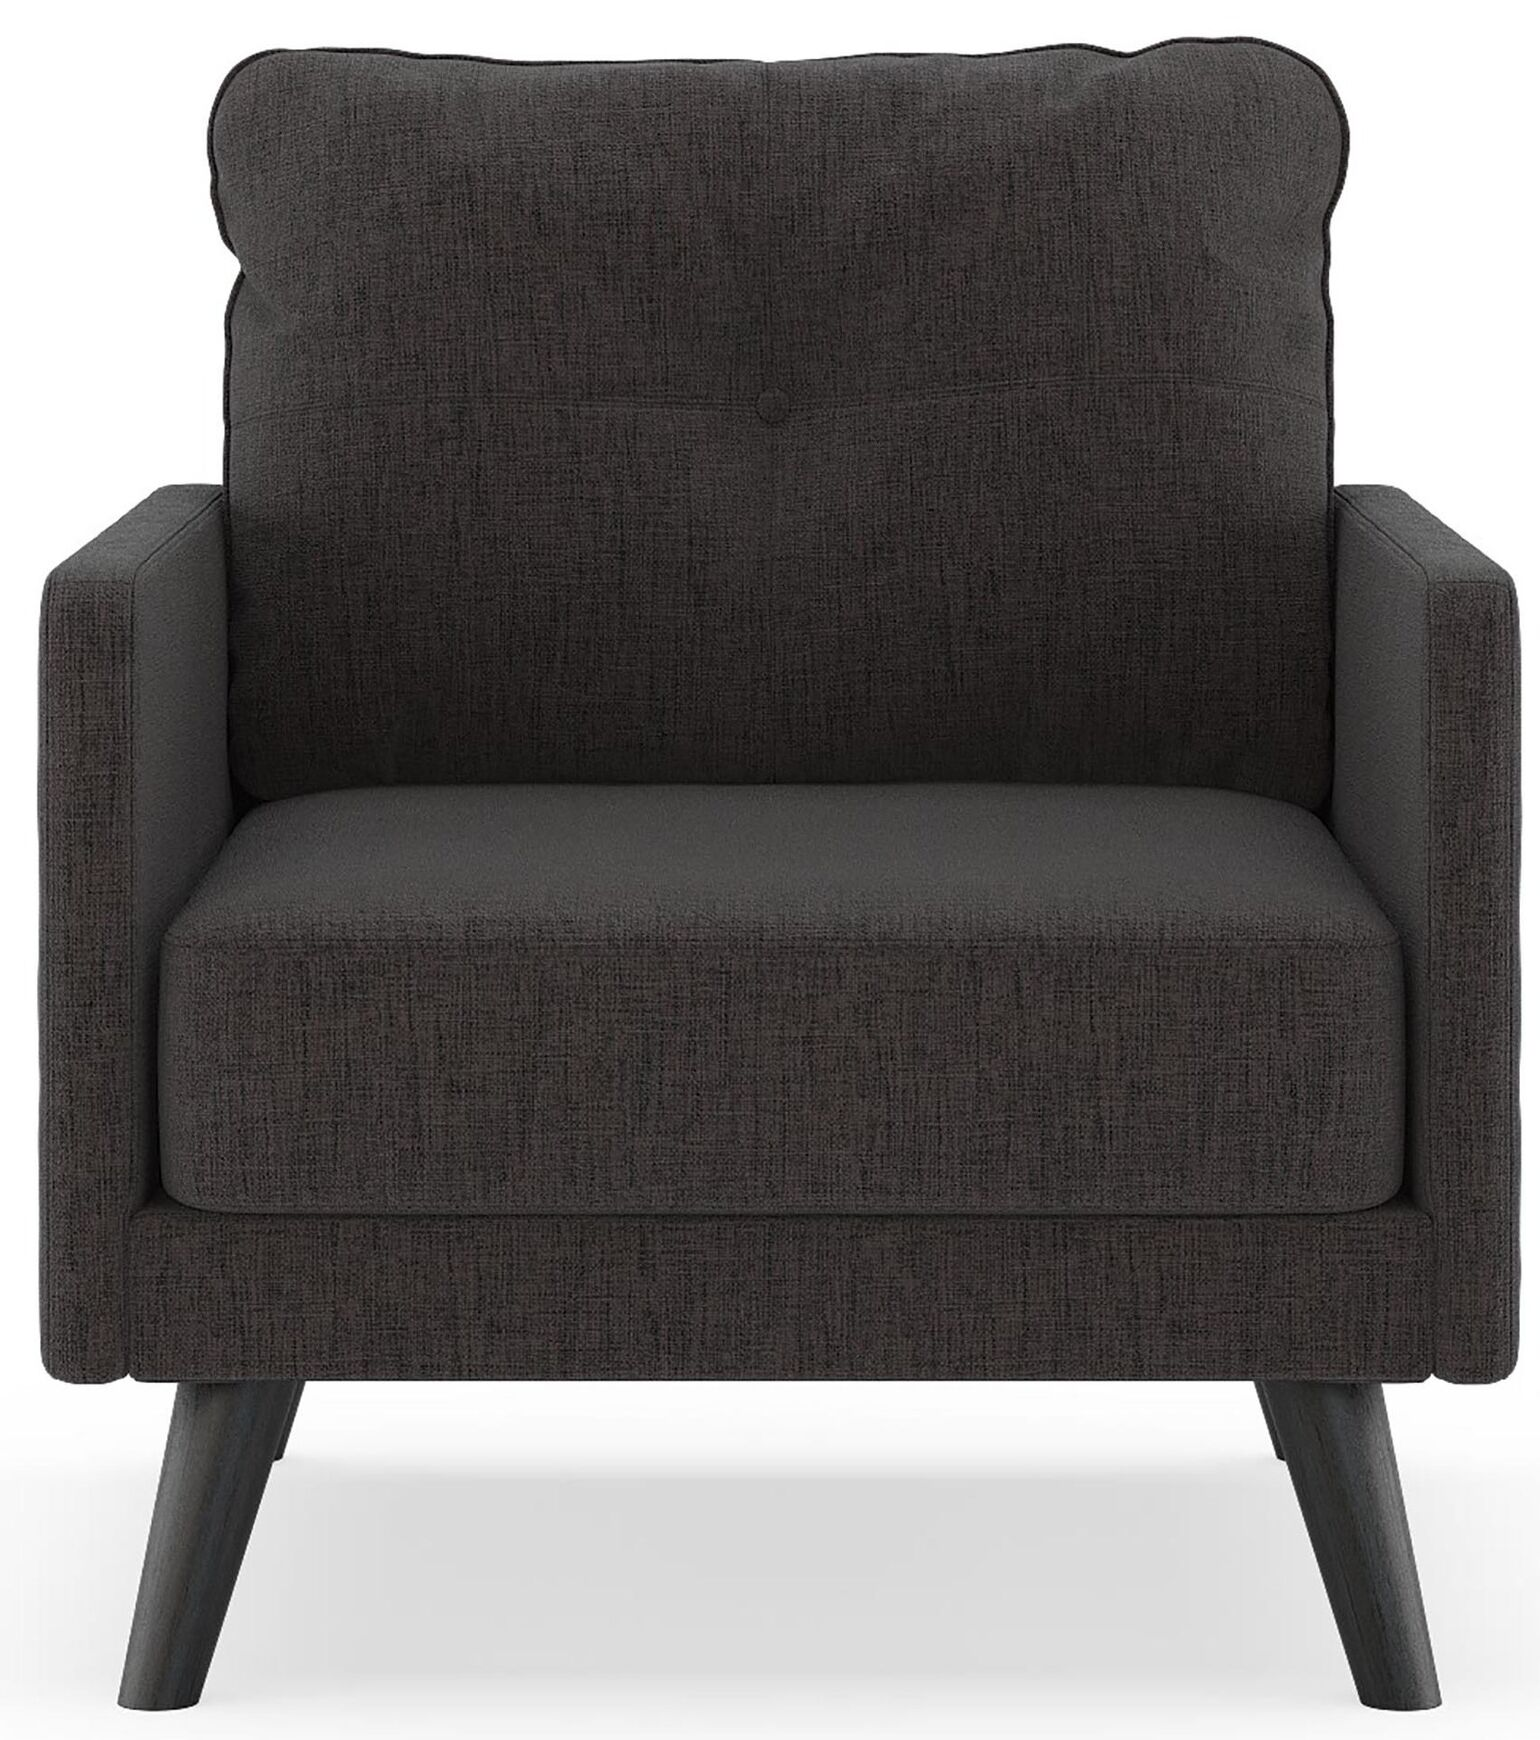 Cowart Pebble Weave Armchair Finish: Black, Upholstery: Heathered Slate